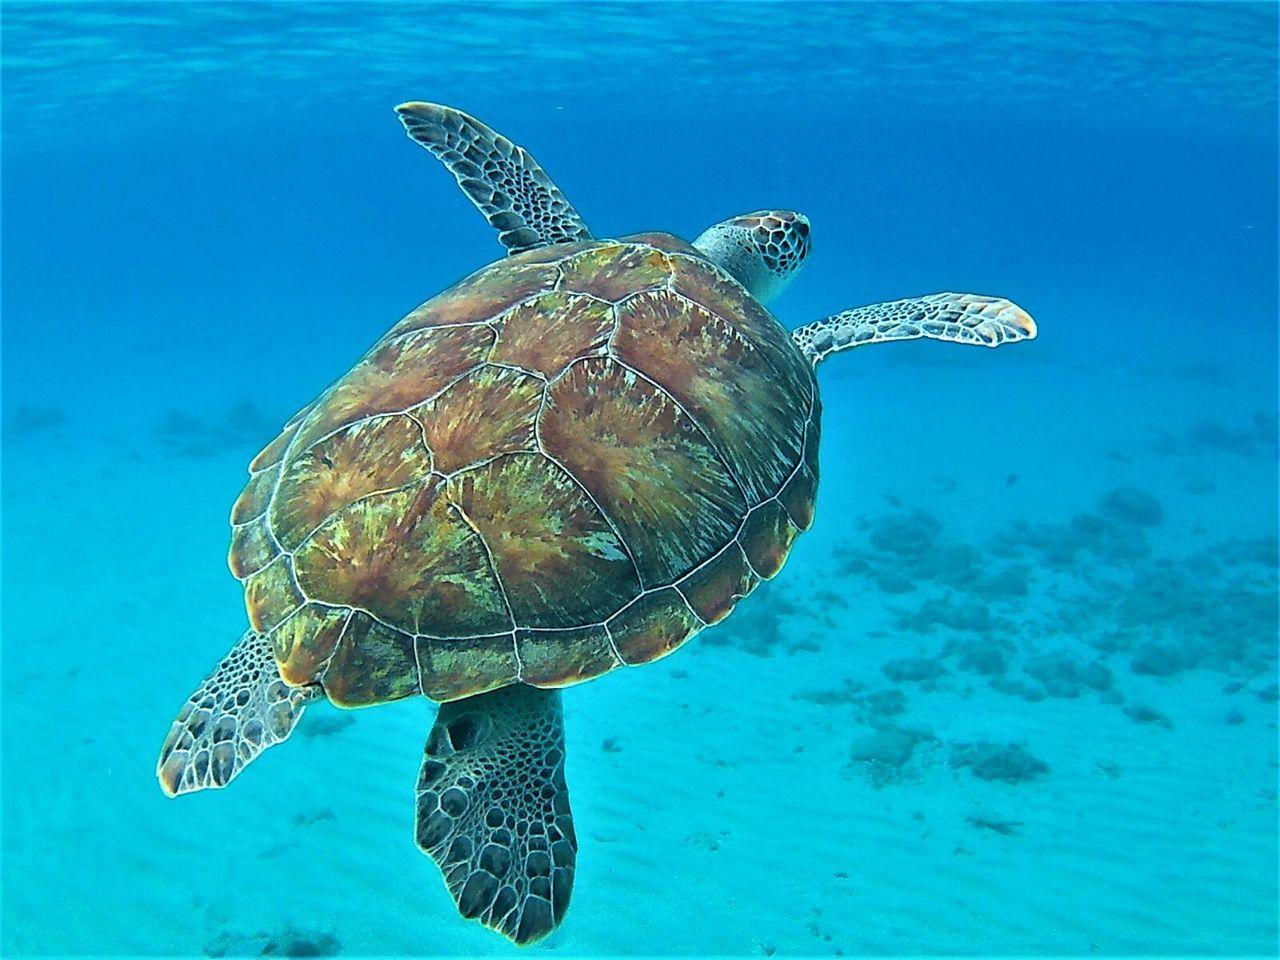 Hawksbill Turtle Underwater Sea Life UnderSea Sea Turtle Scuba Diving Curacao Summer Blue Snorkeling Animals In The Wild Wildlife Westpunt Hawksbill